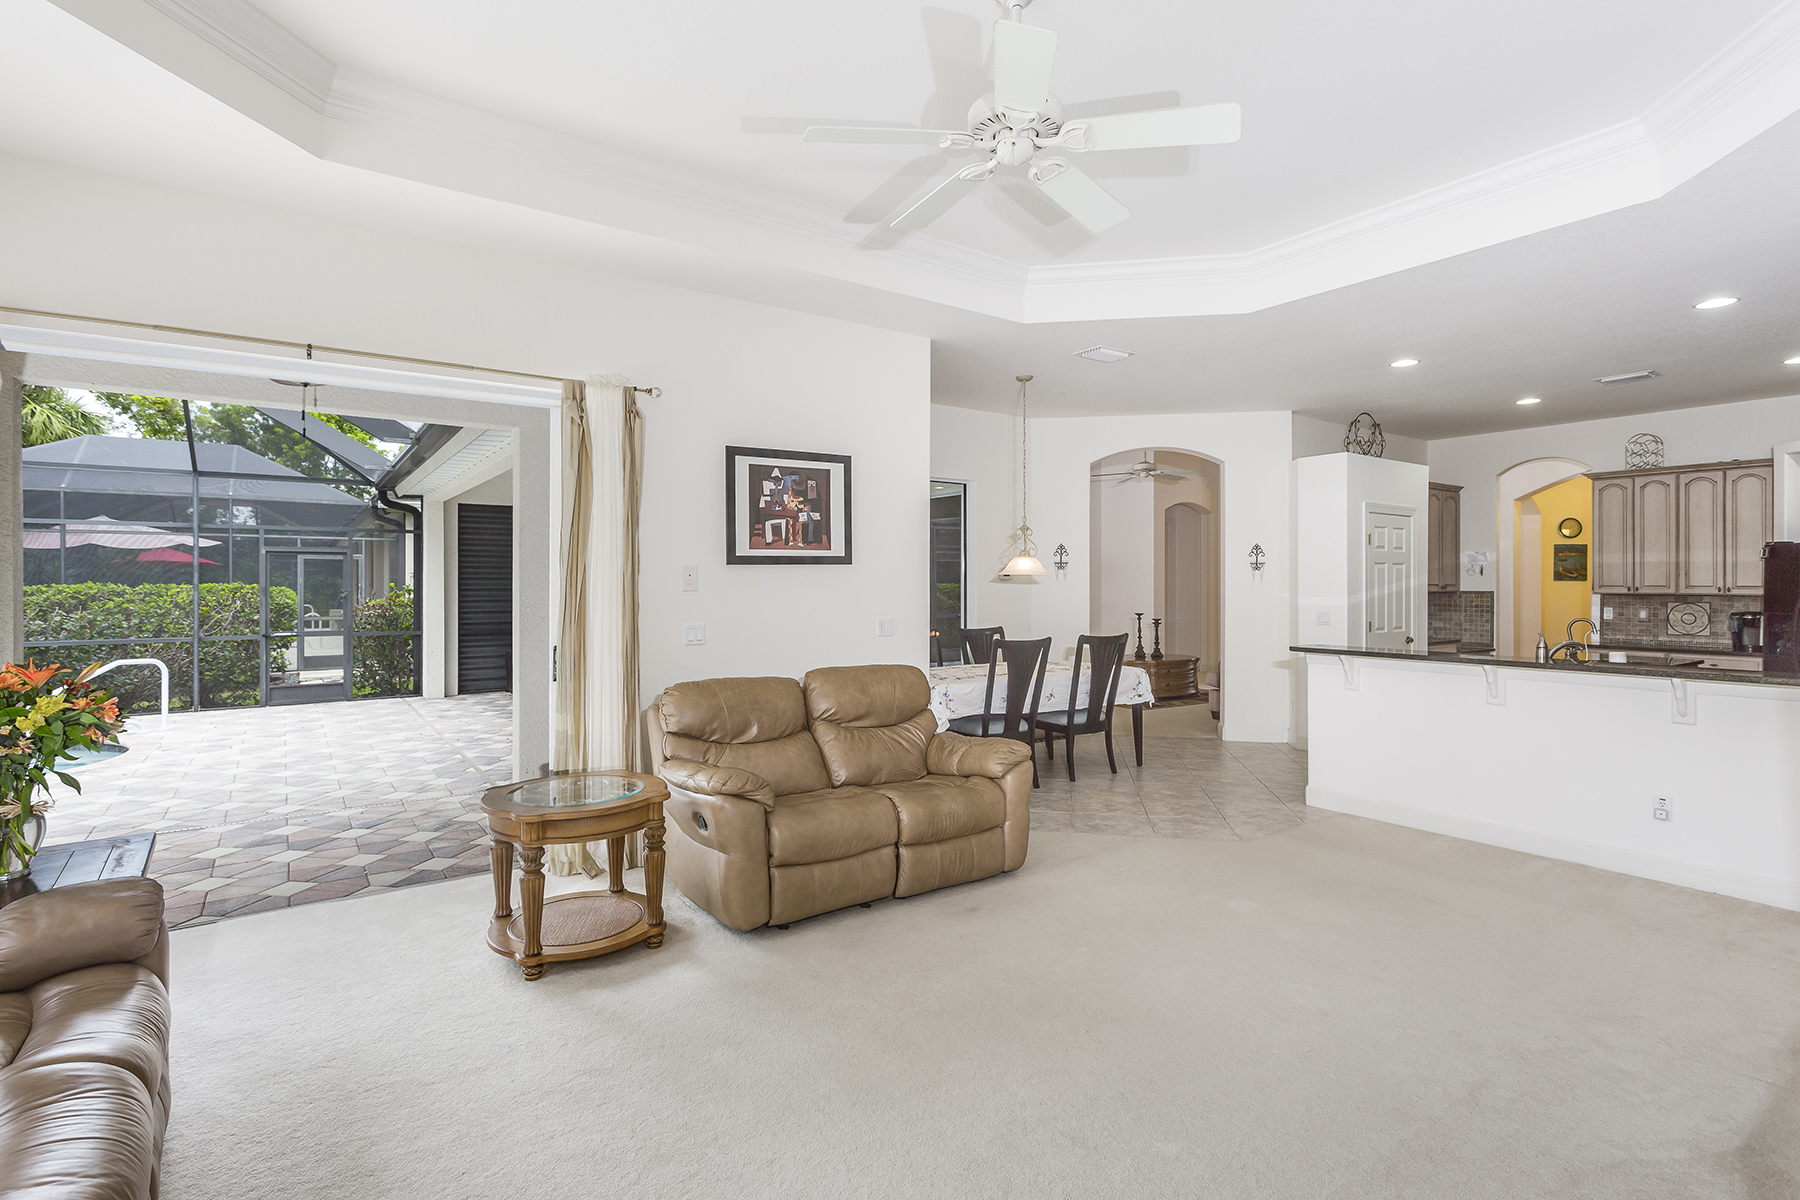 Additional photo for property listing at DELASOL 15985  Delarosa Ln,  Naples, Florida 34110 United States